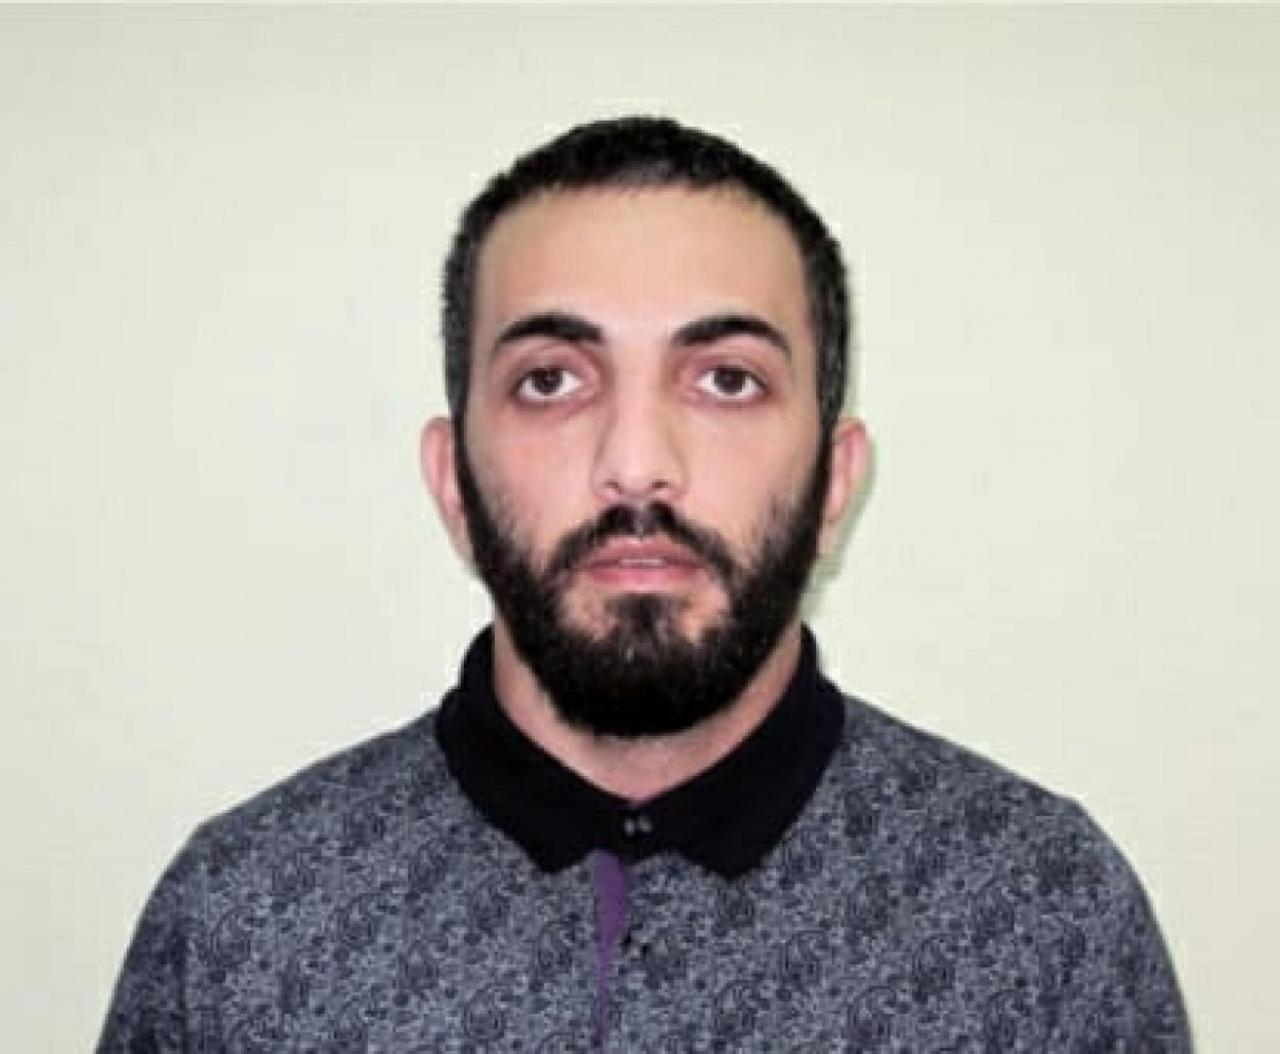 Арестован азербайджанец, присоединившийся к террористам в Сирии